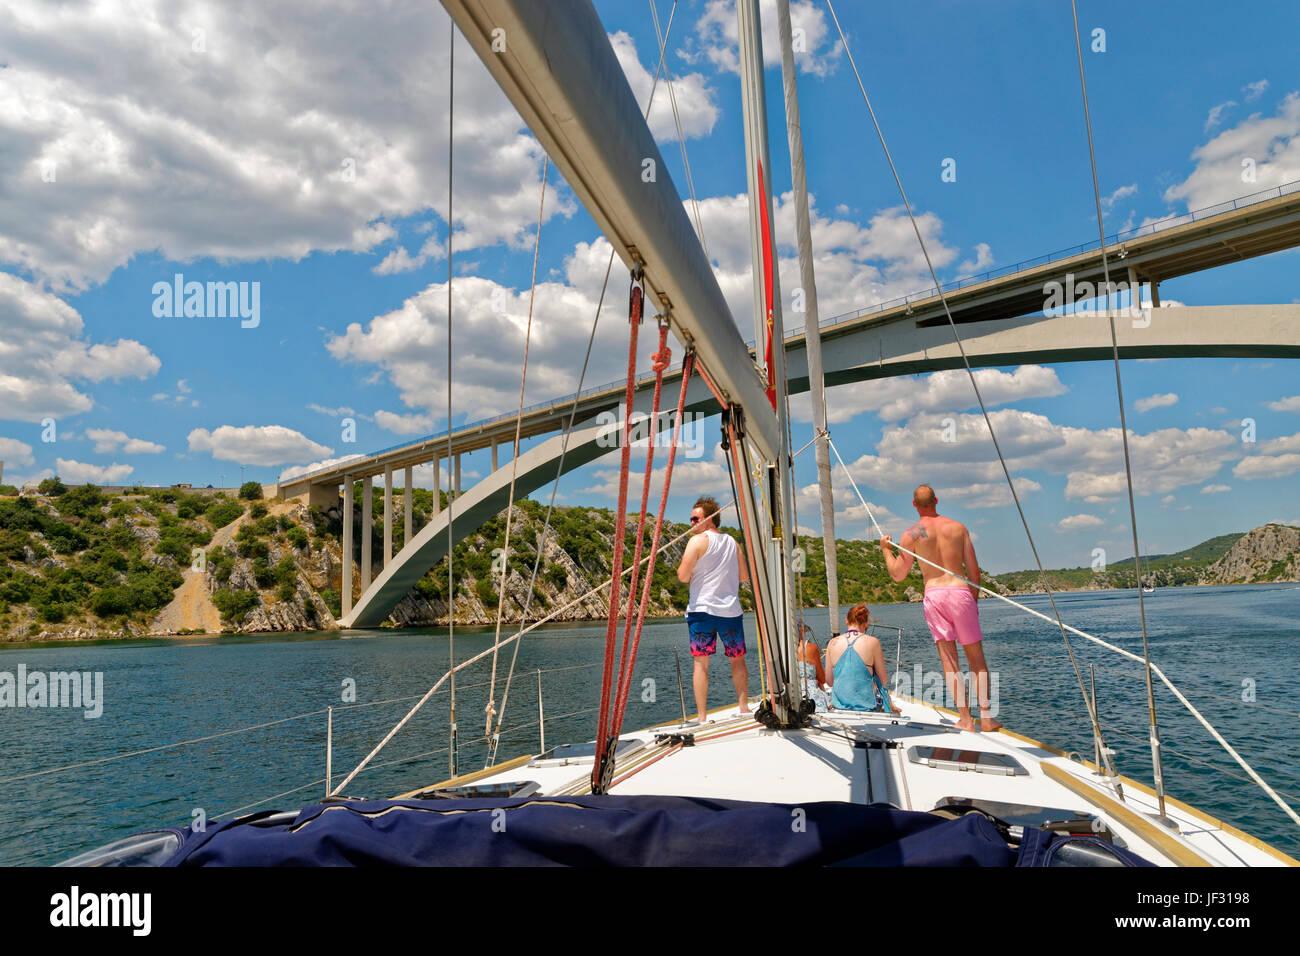 Cruising the Cikola River up to the Krka National Park and waterfalls near Sibenik, Croatia. - Stock Image